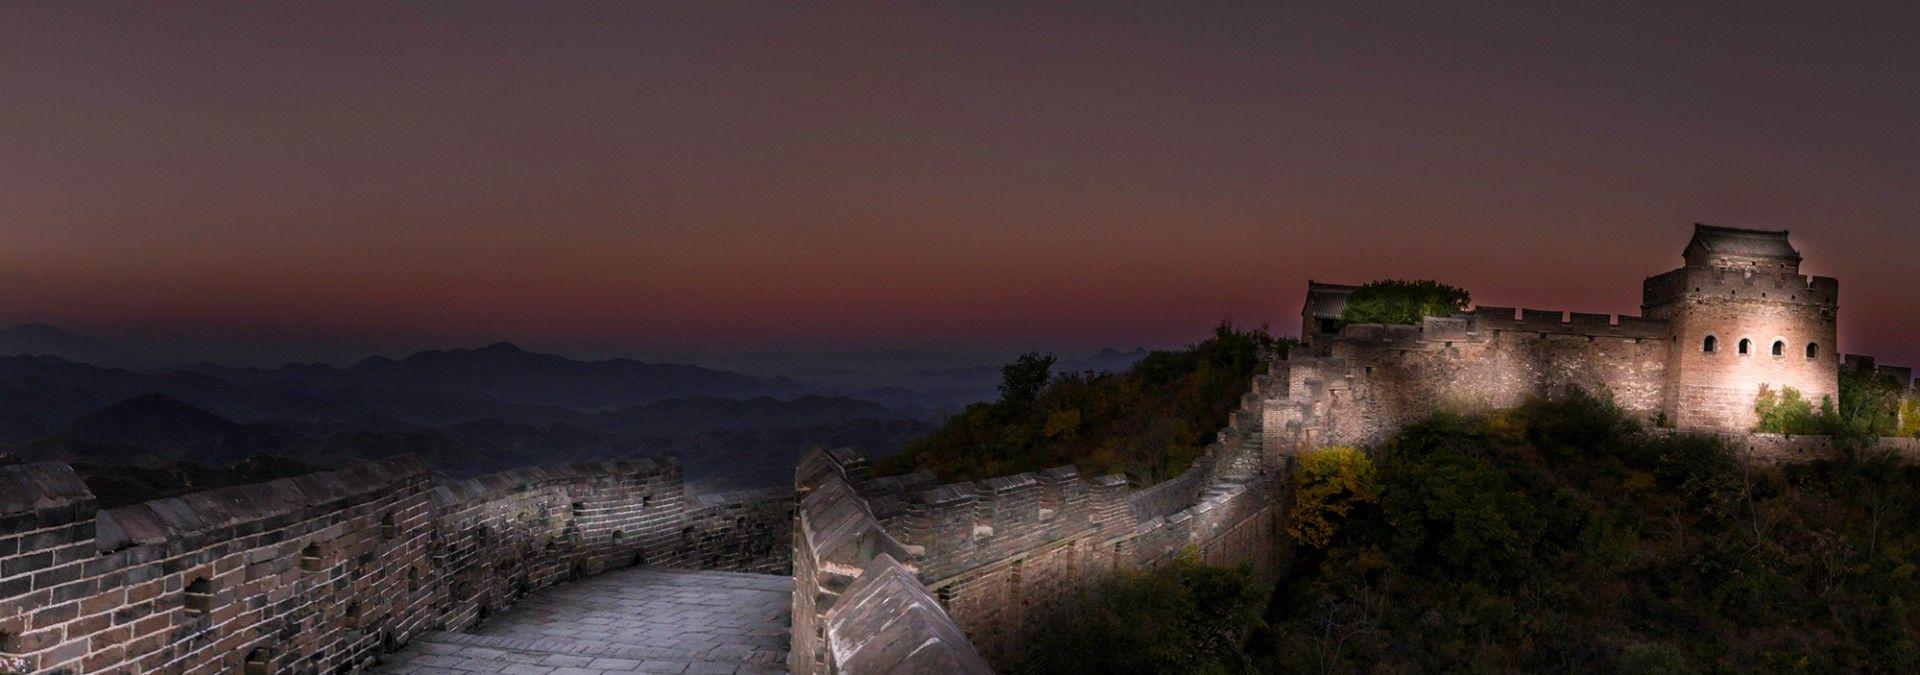 1478602504-1477310321-1477309171-great_wall_of_china_evening_vistajpg.jpg